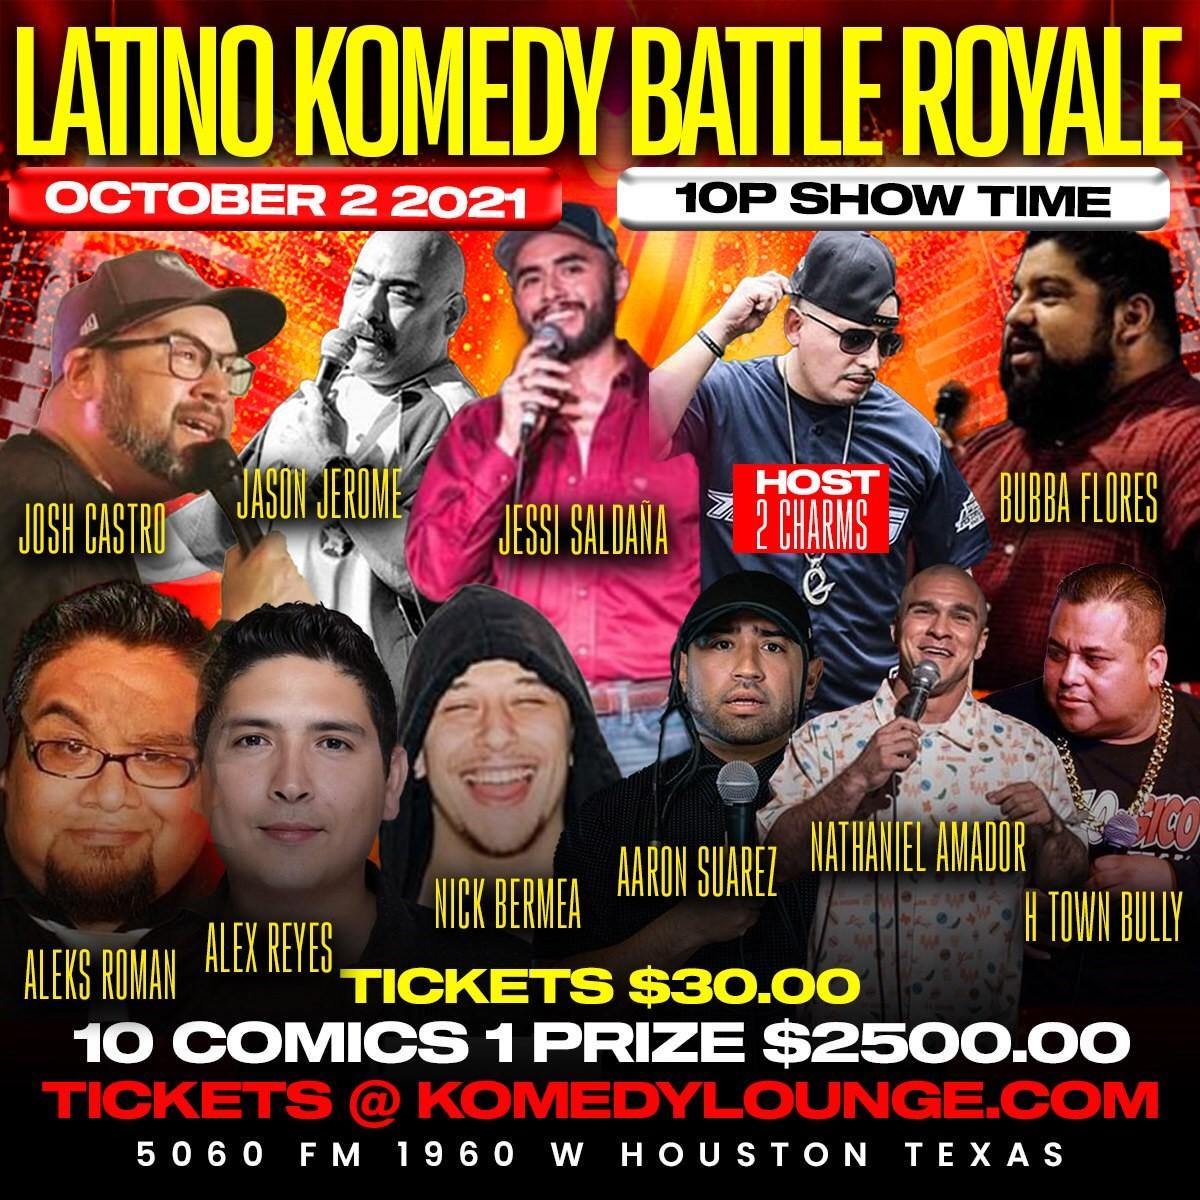 Latino Komedy Battle Royale  on Oct 02, 22:00@Komedy Lounge - Buy tickets and Get information on komedylounge.com